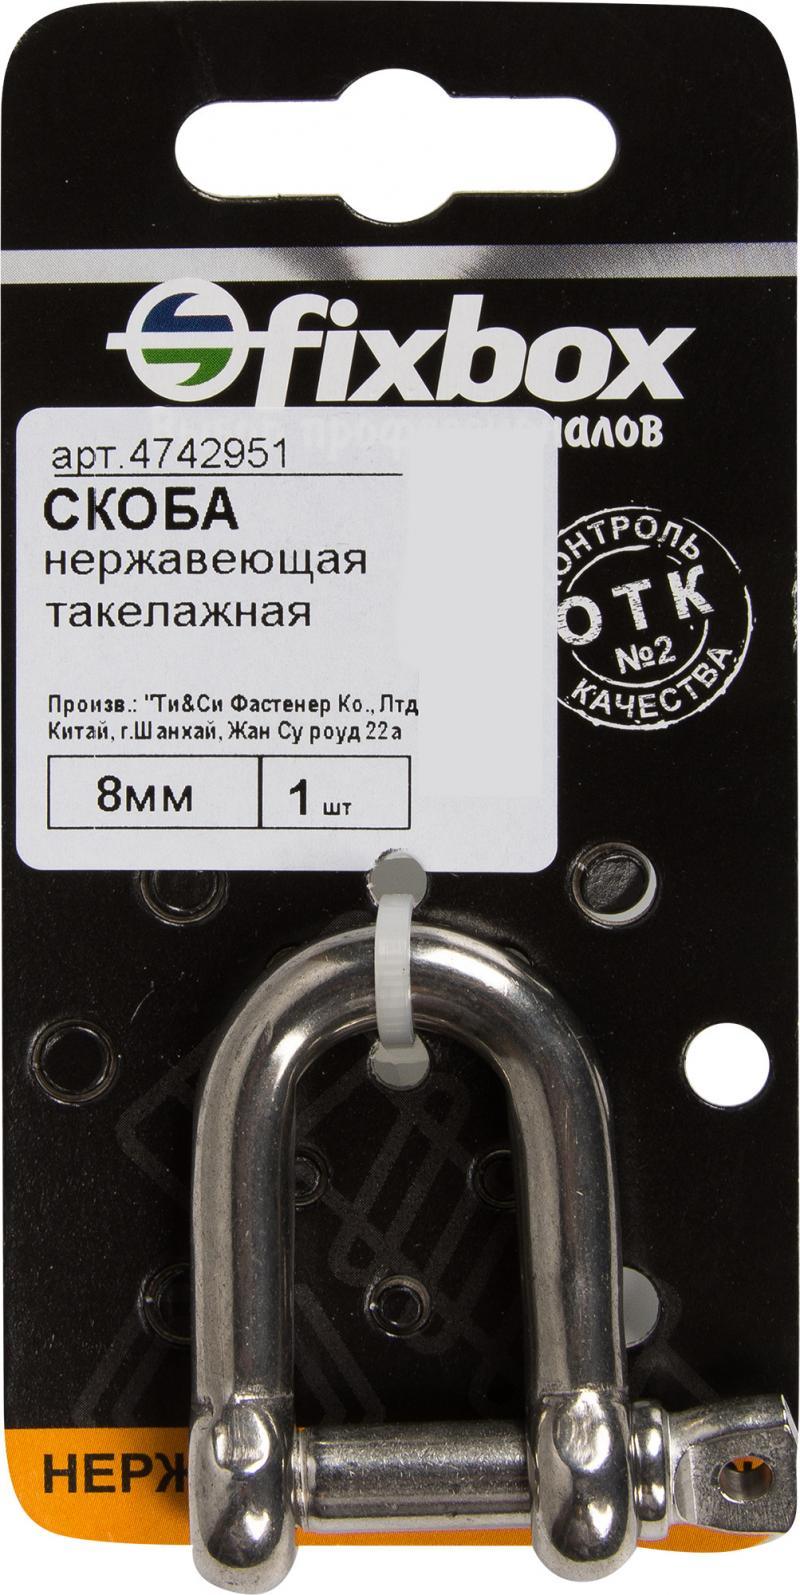 Скоба такелажная 8 мм, нержавеющая сталь